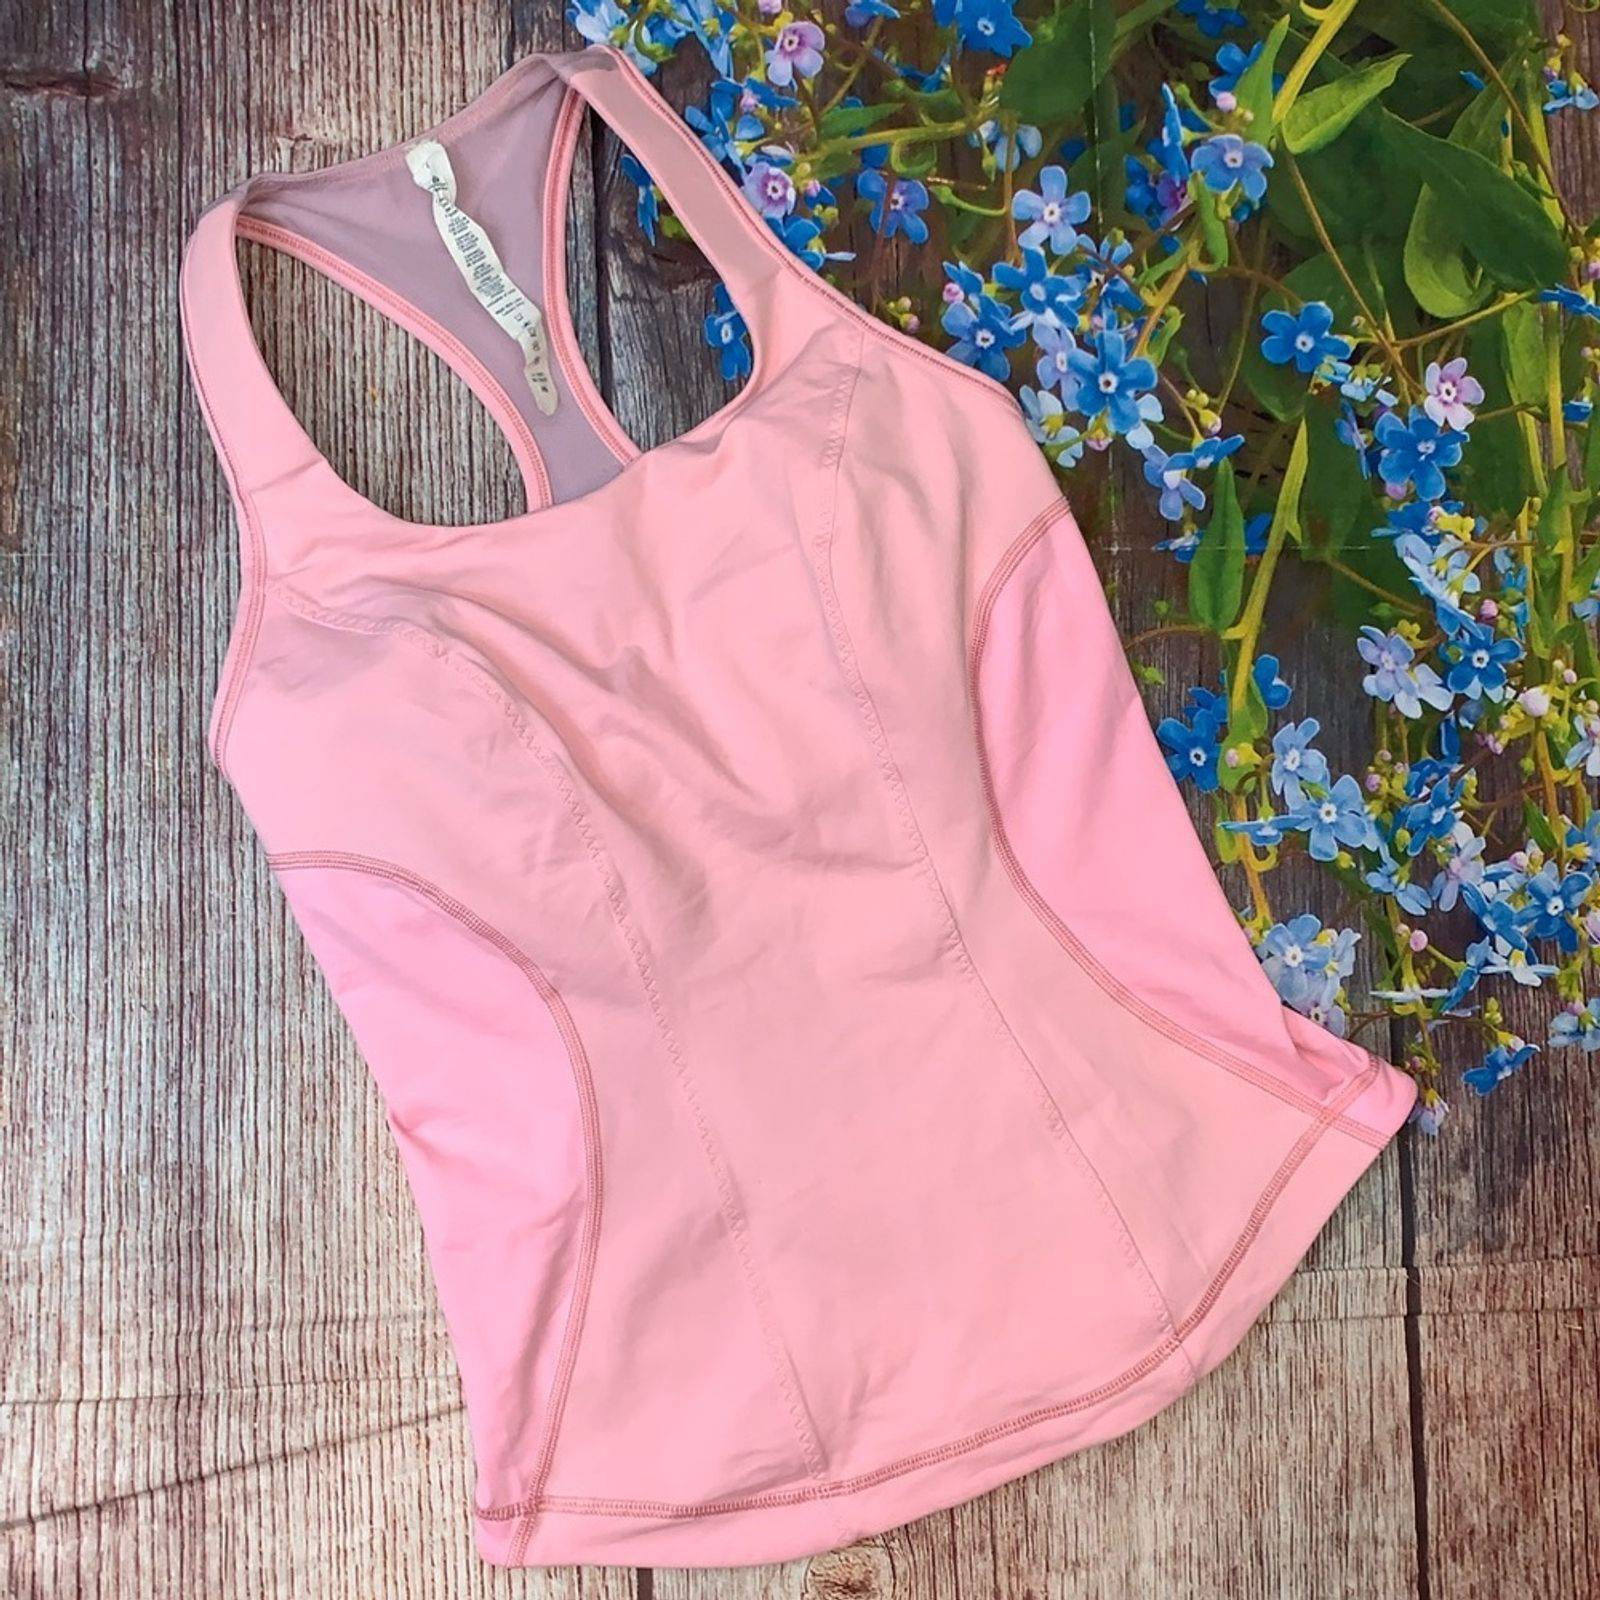 Lululemon Cardio Kick Tank Coral Pink  8